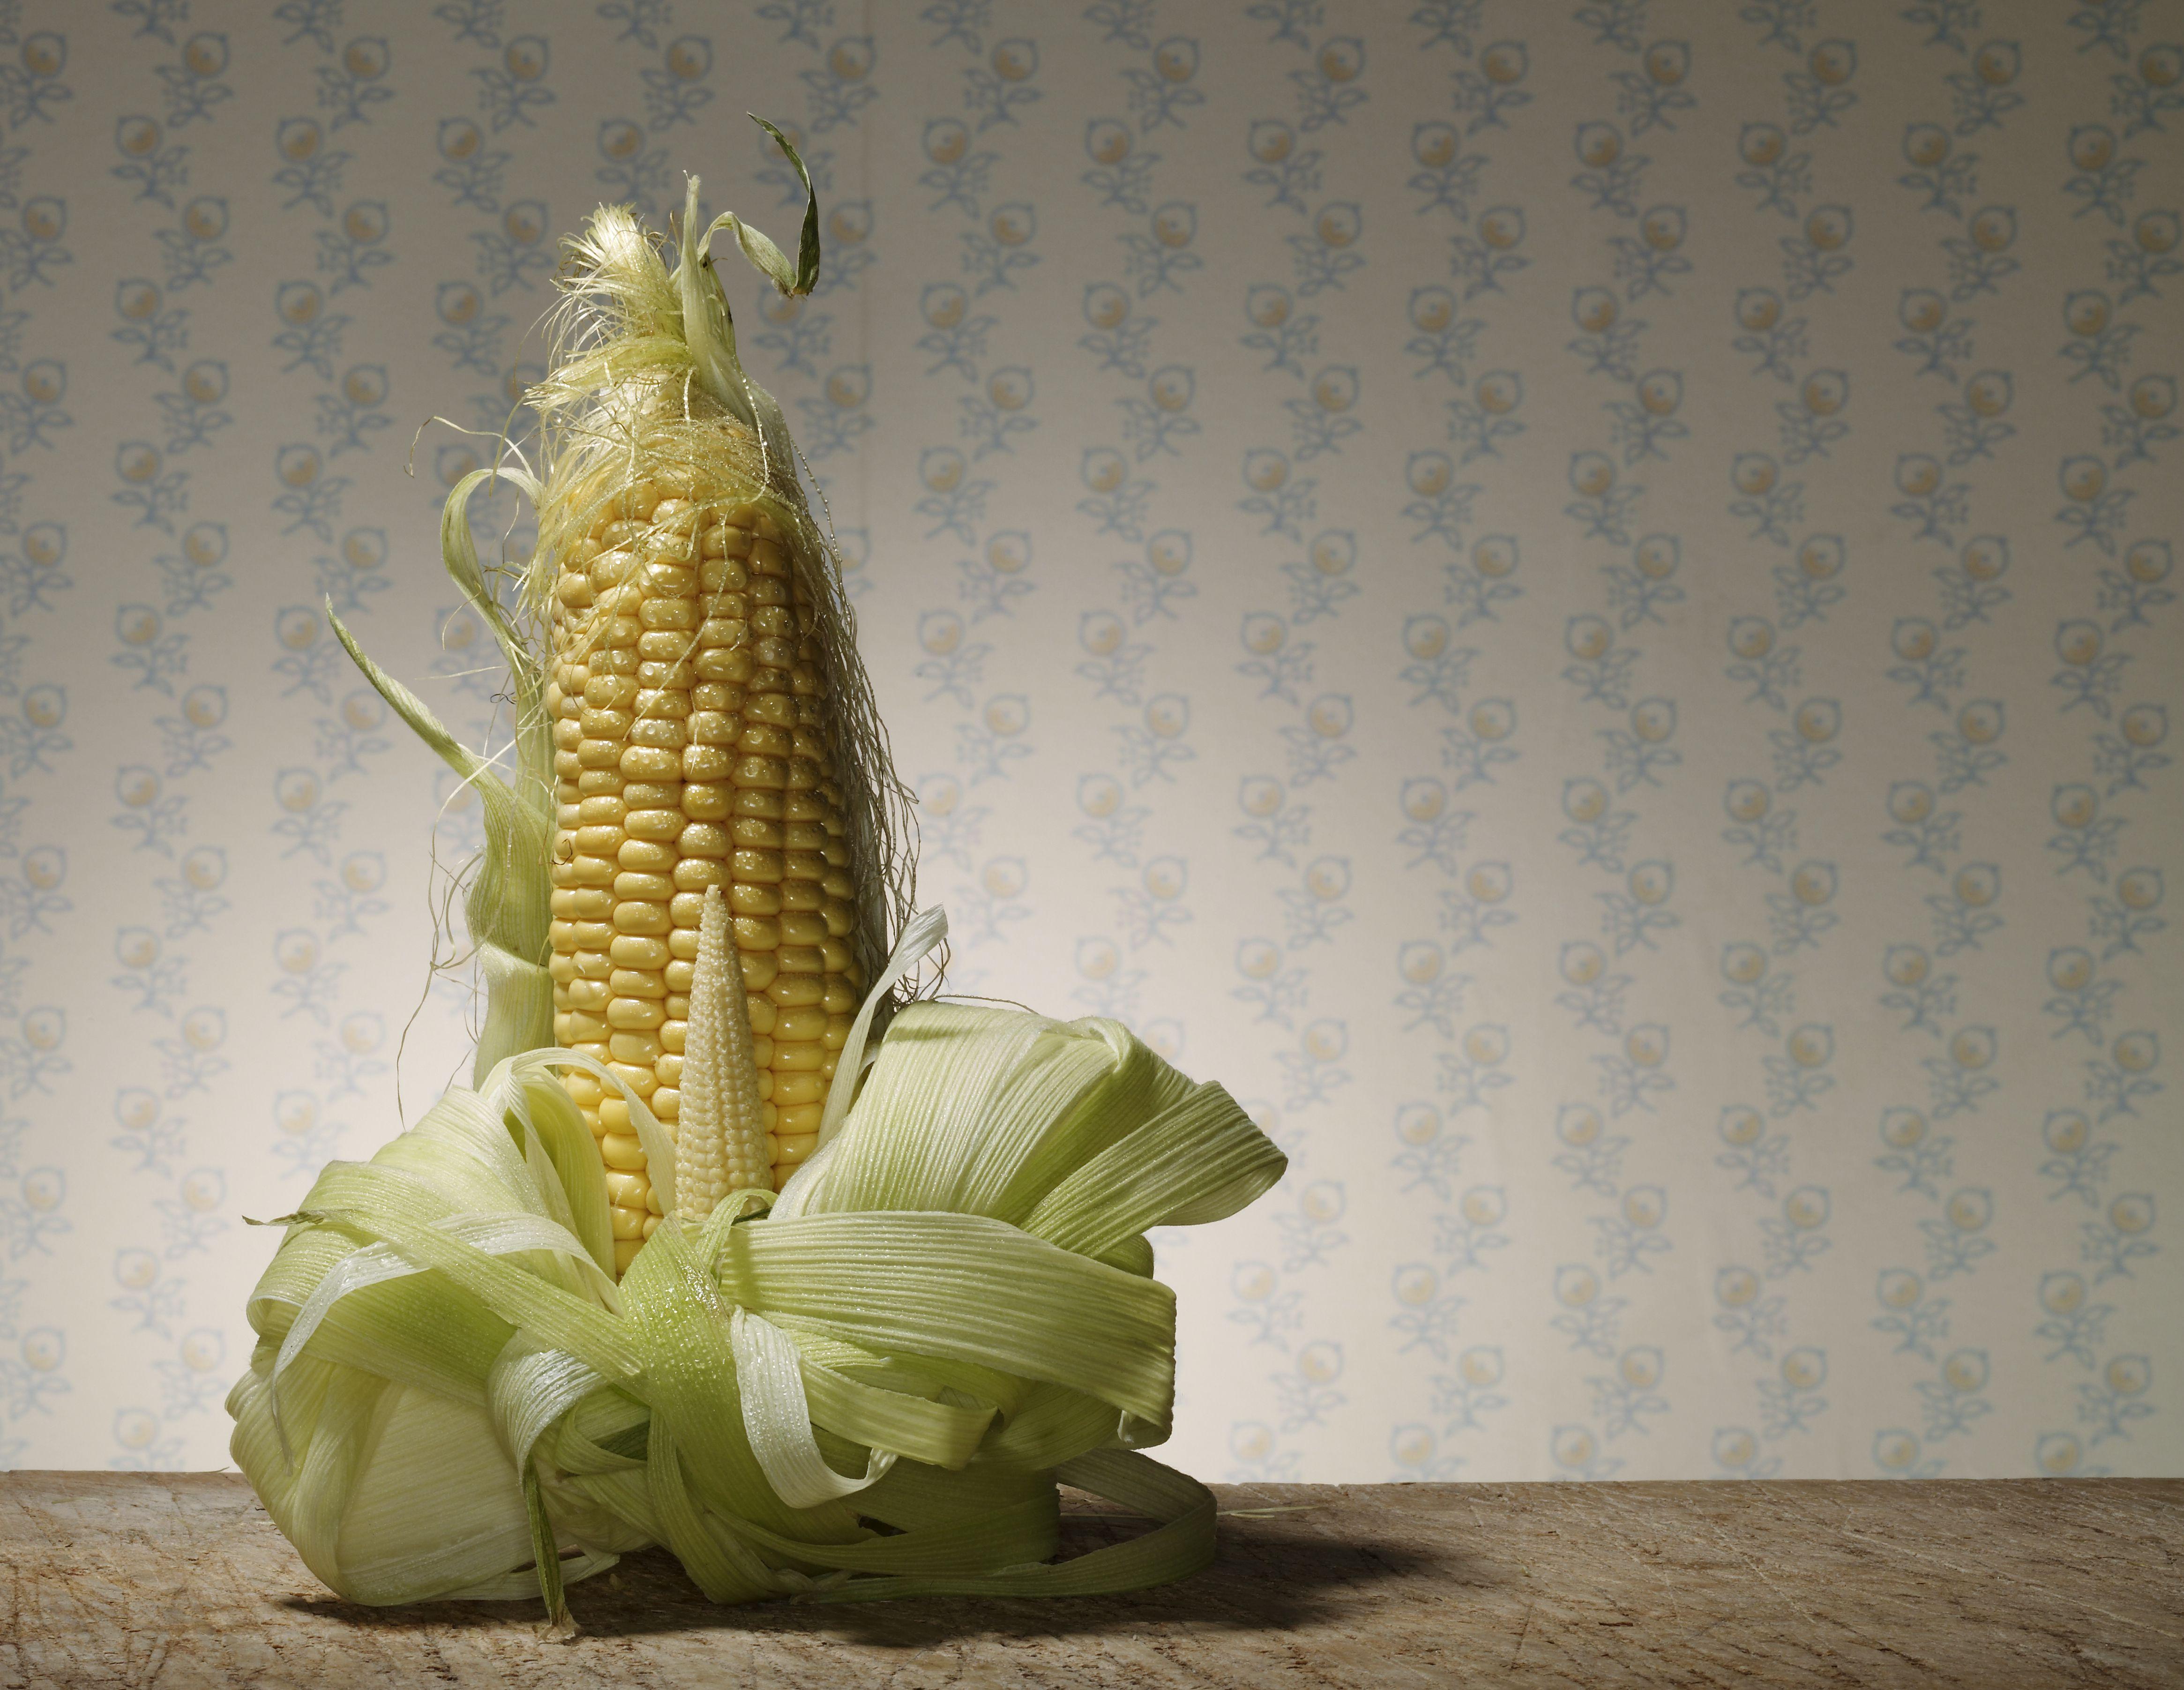 Ear of corn artistically presented